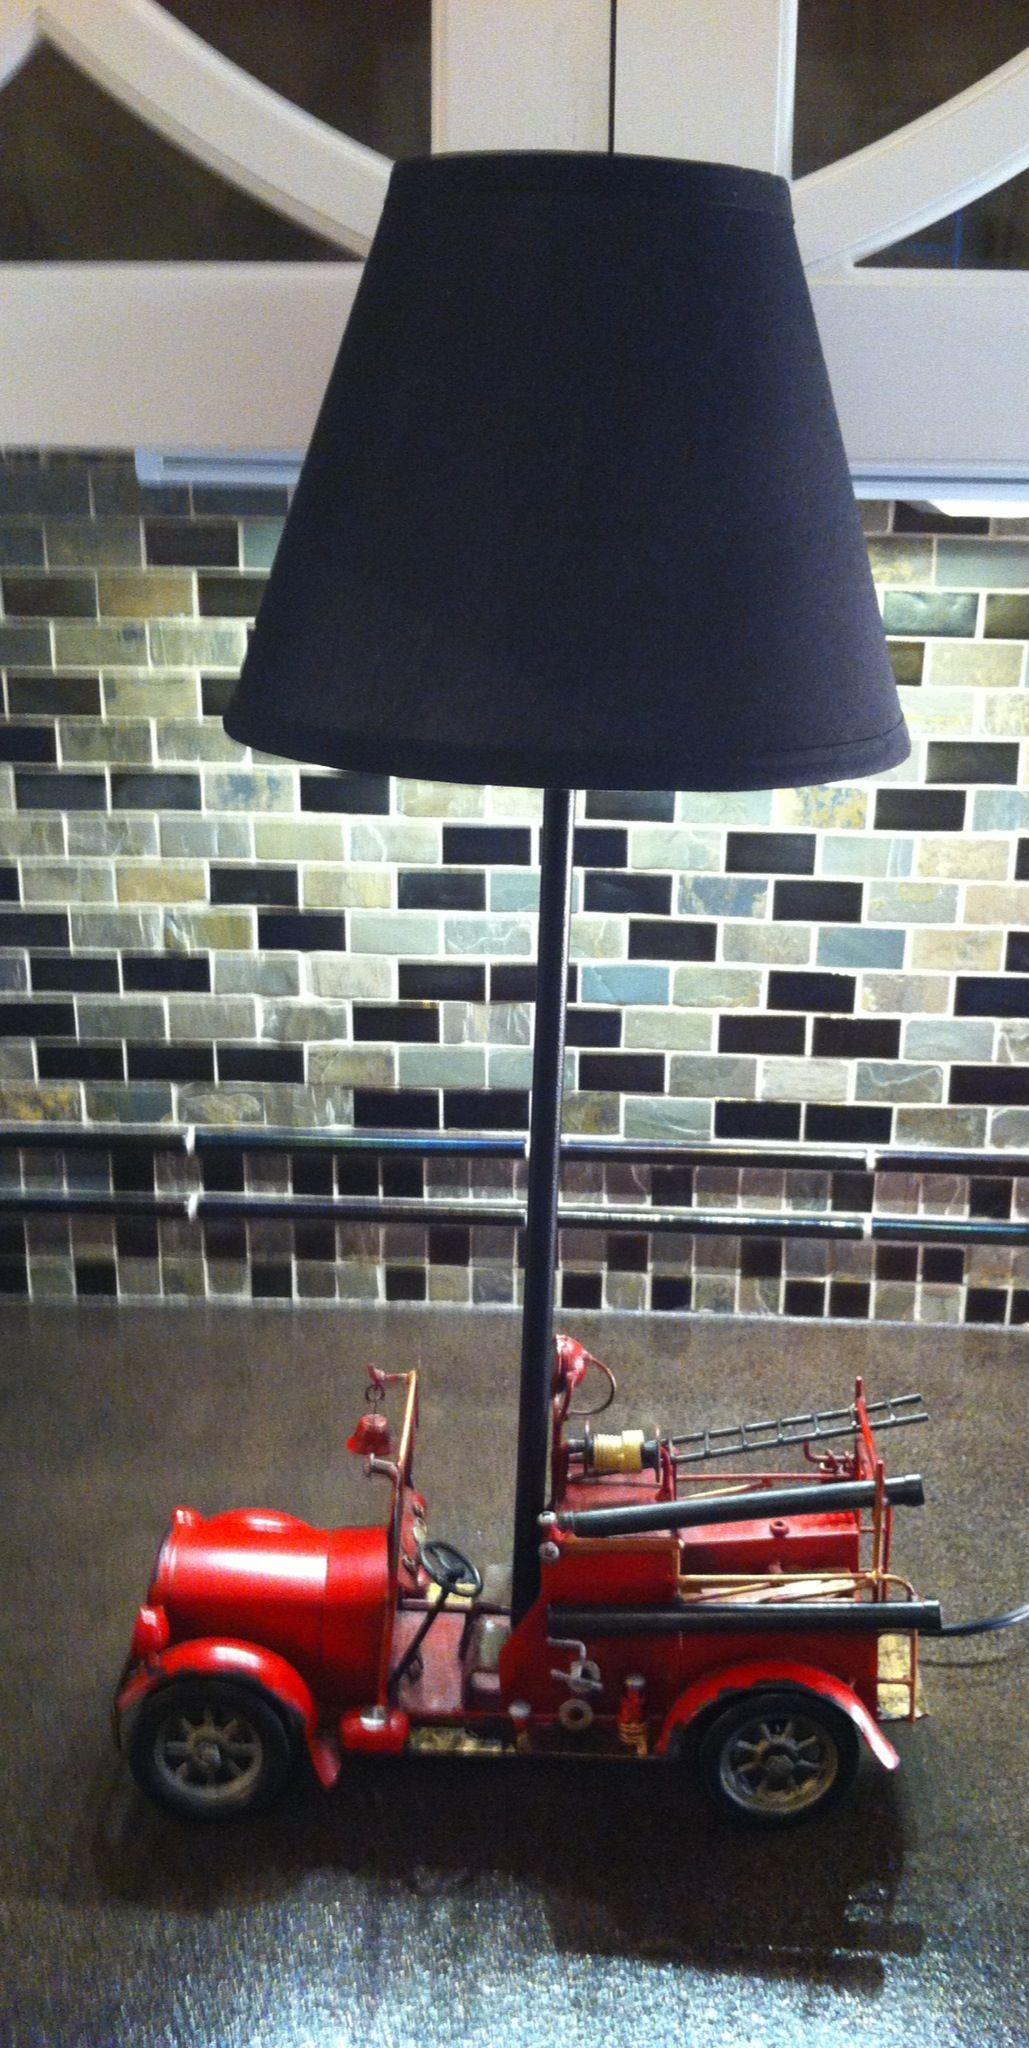 Elegant Fire Truck Lamp   @cuckoolandcom   Unique Gift Shop #dreamkidsbedroom  #competition